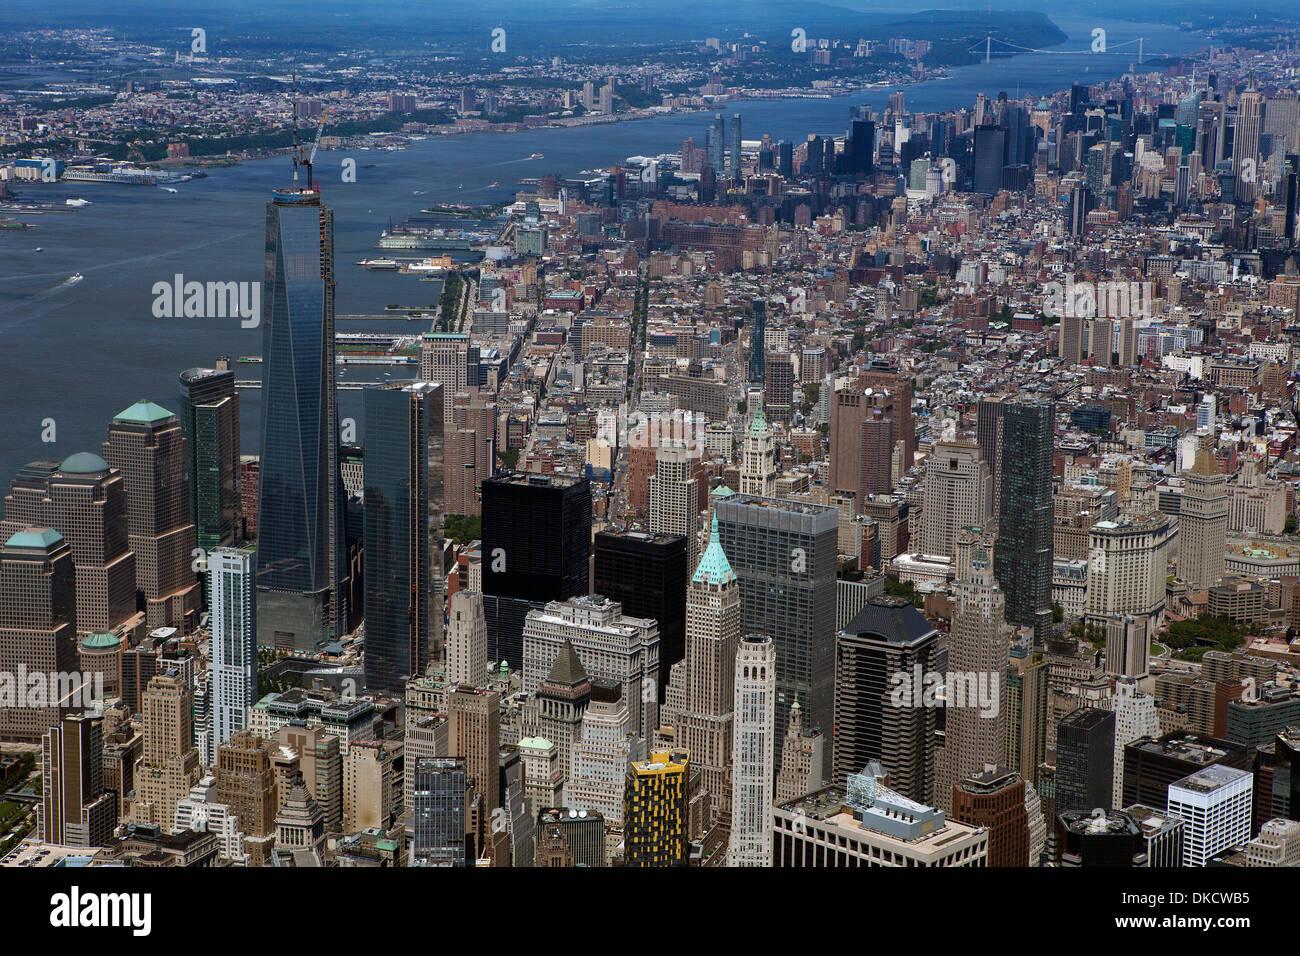 aerial photograph Lower Manhattan, New York City - Stock Image